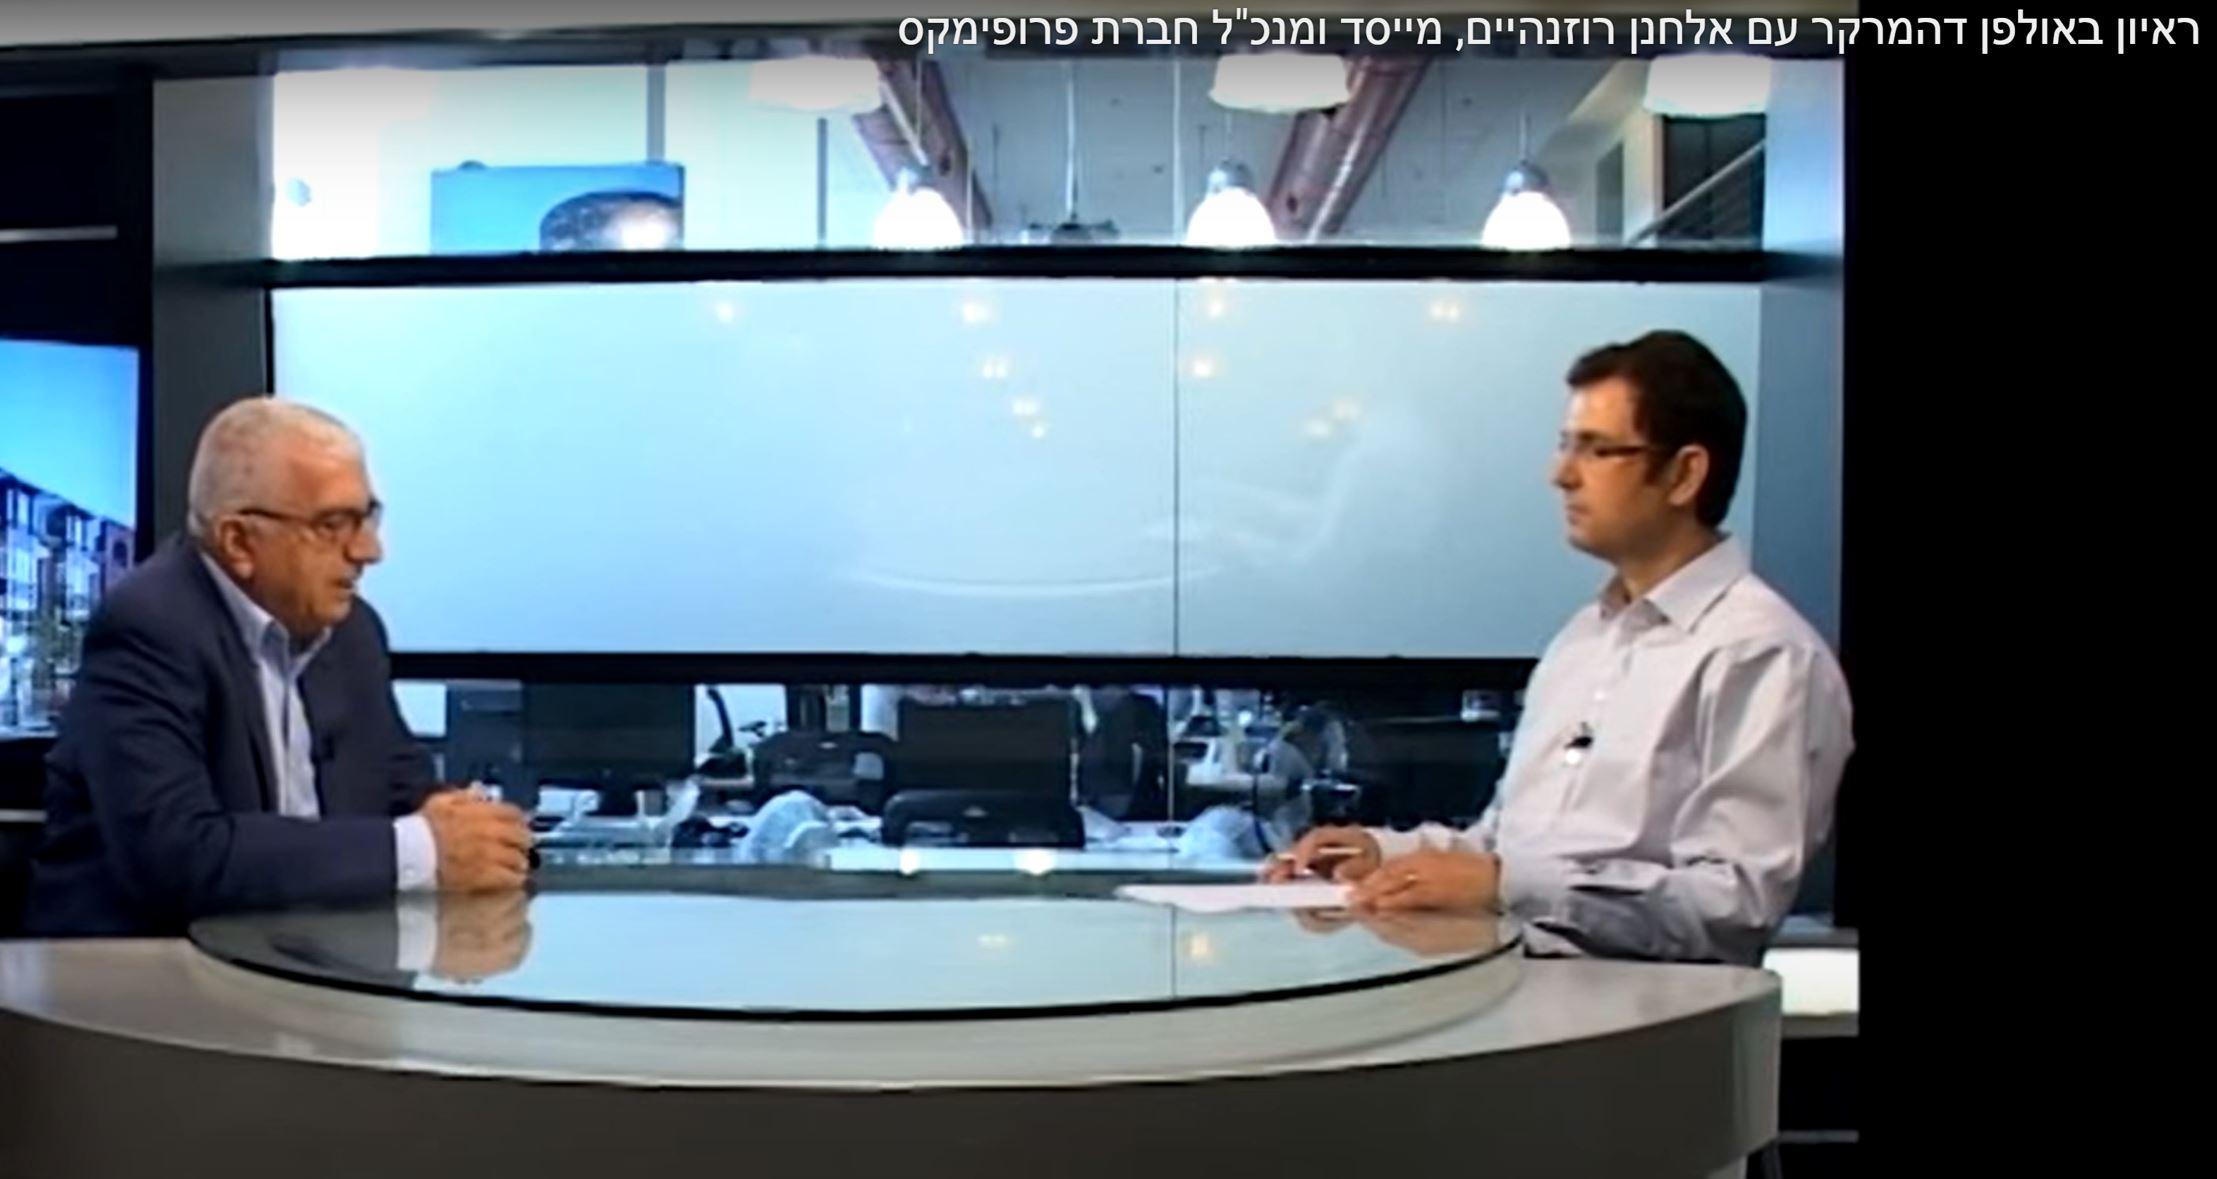 ראיון אלחנן דה מרקר 10.2015